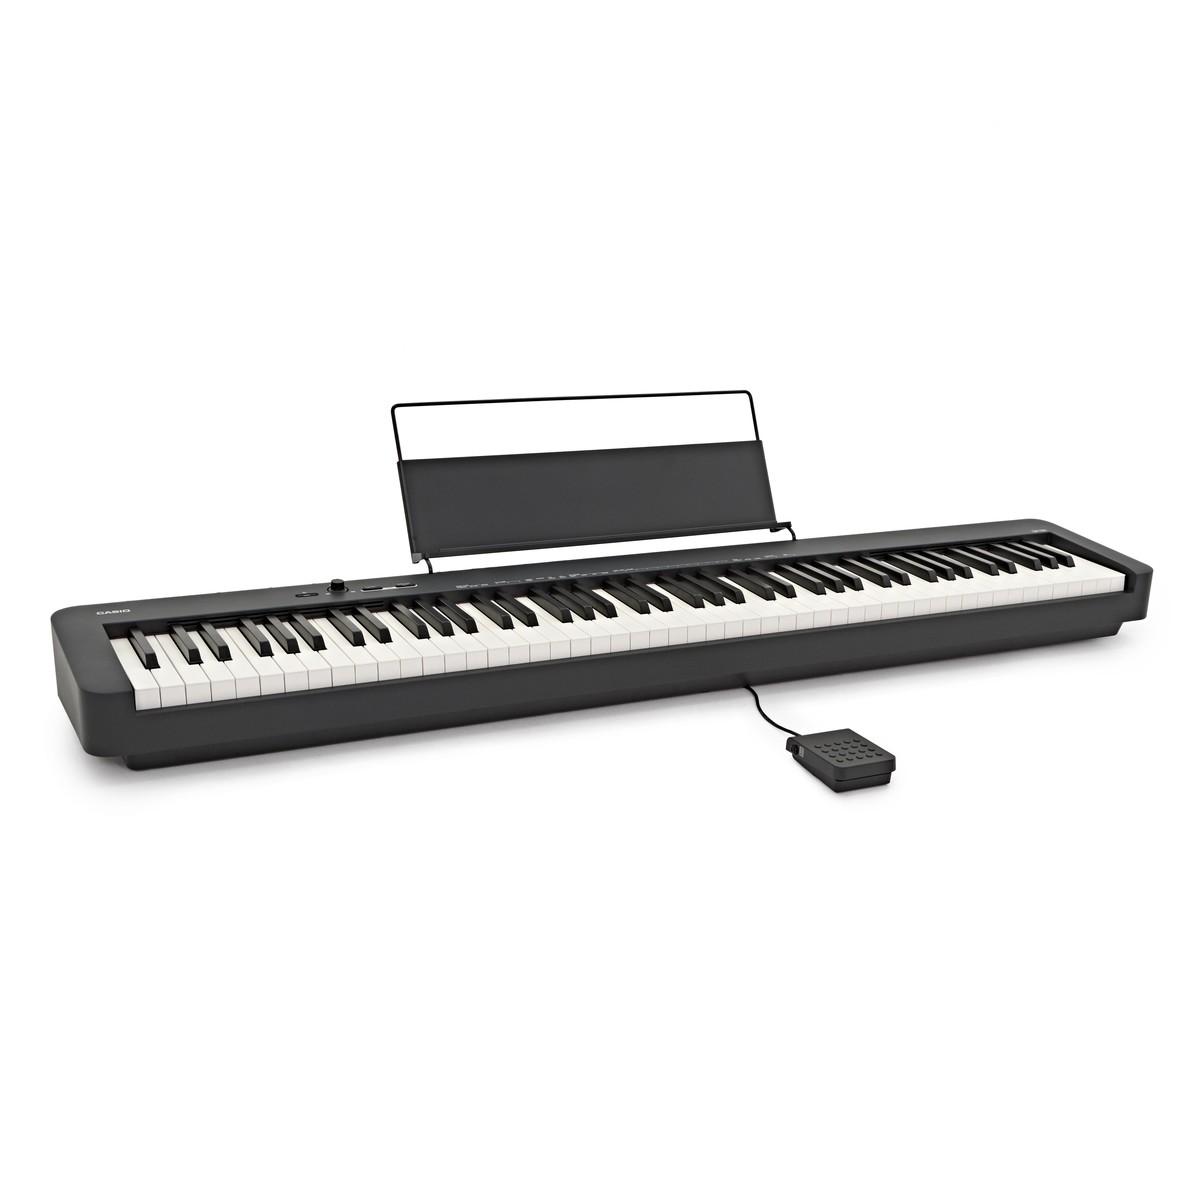 casio cdp s100 digital piano black at gear4music. Black Bedroom Furniture Sets. Home Design Ideas